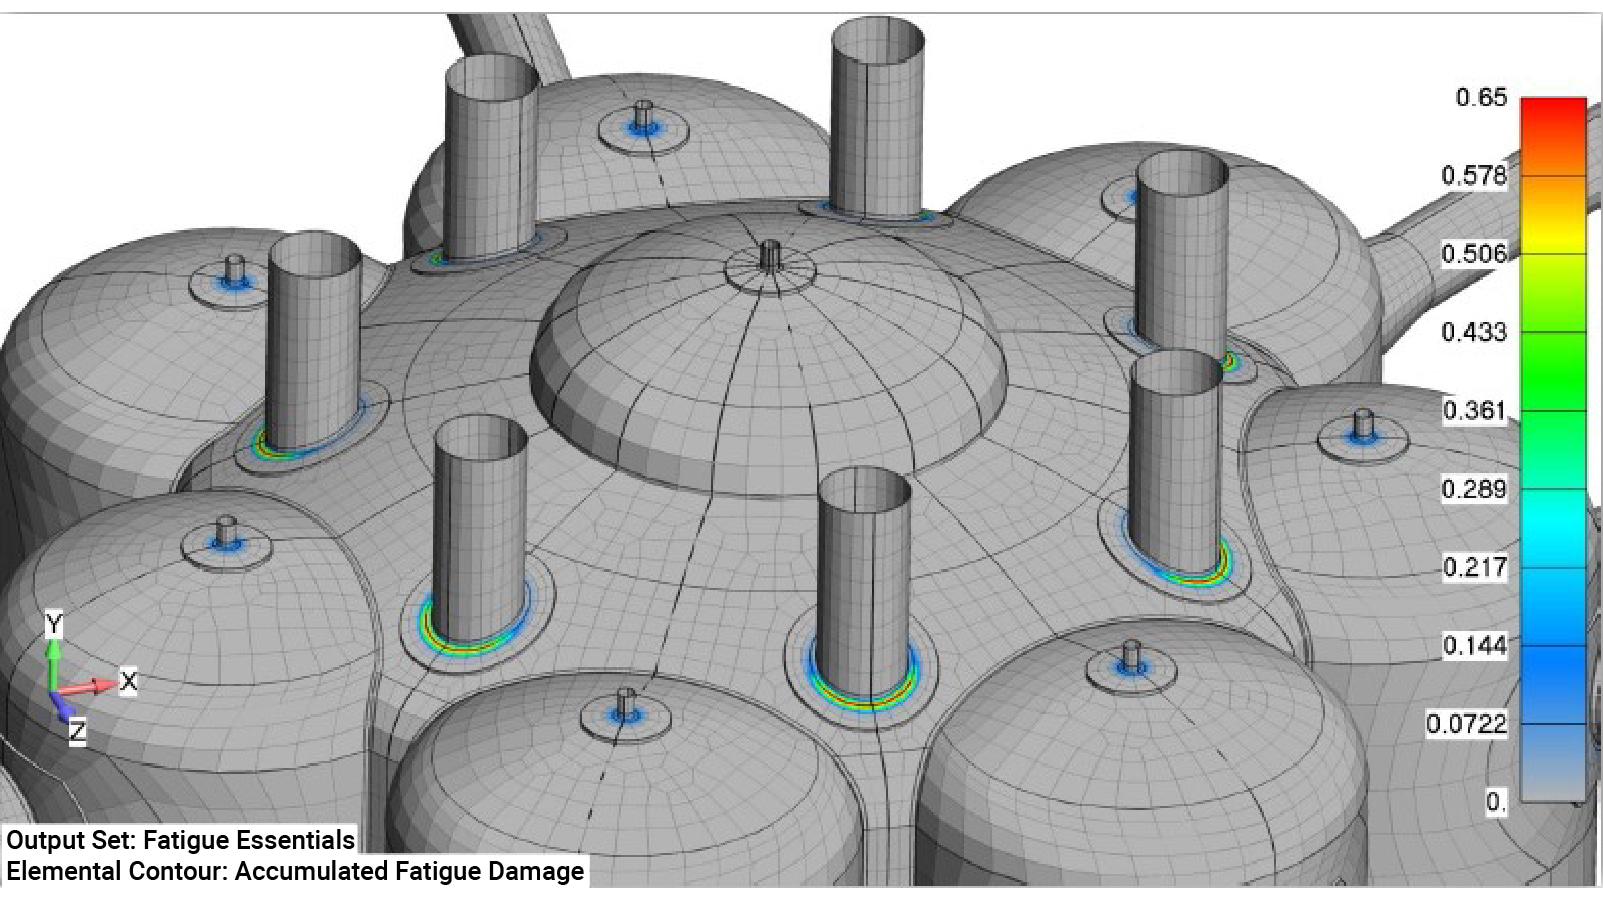 Fatigue essentials analysis for ASME pressure vessel consulting